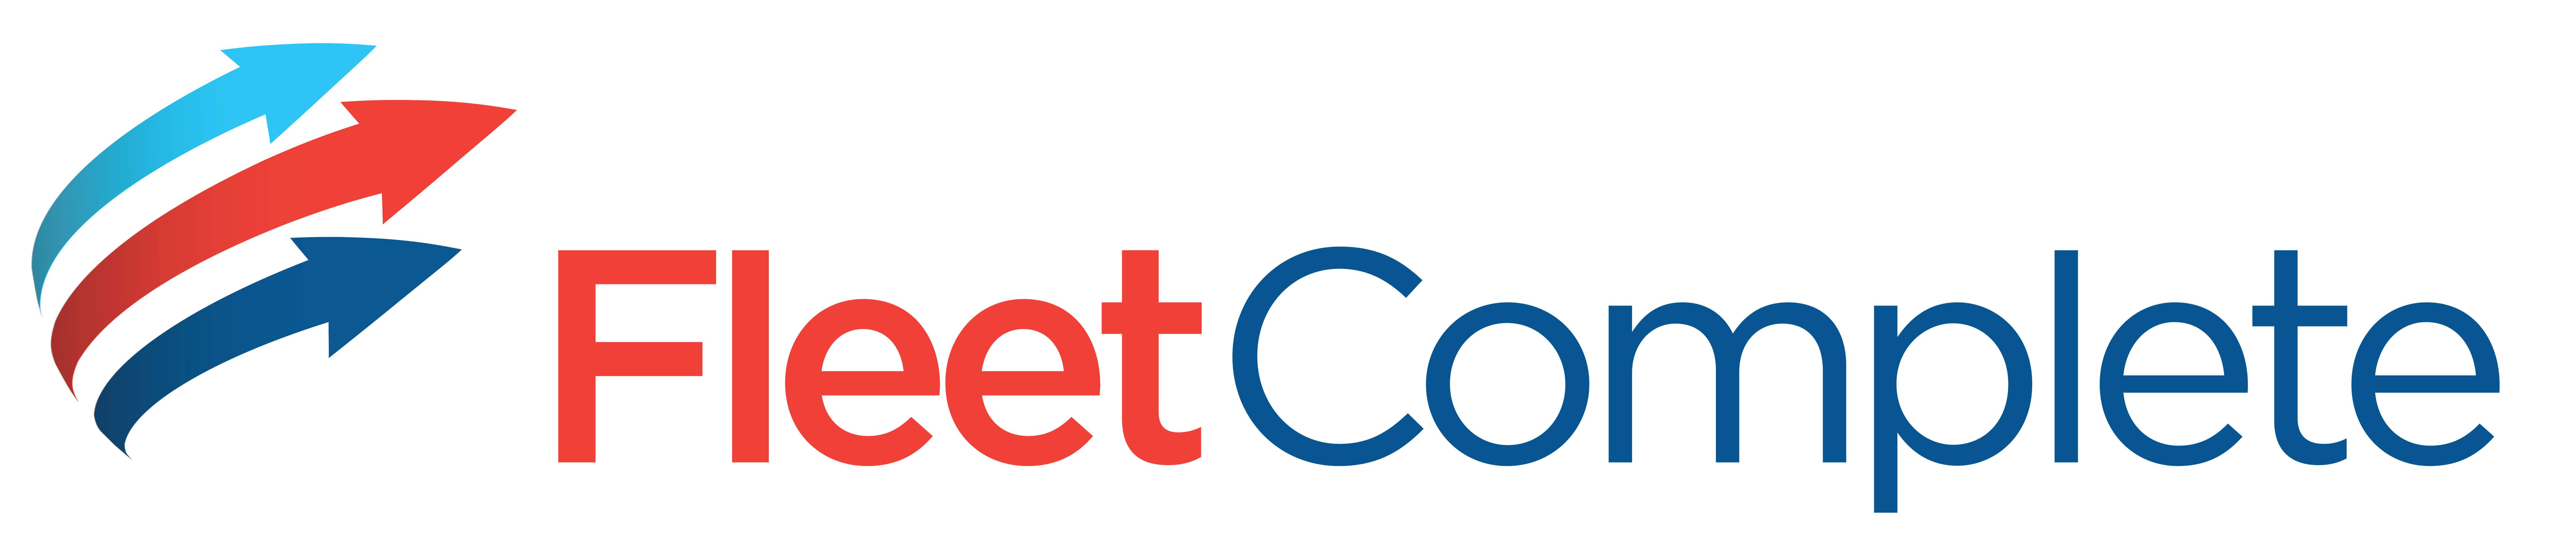 Fleet Complete Germany GmbH